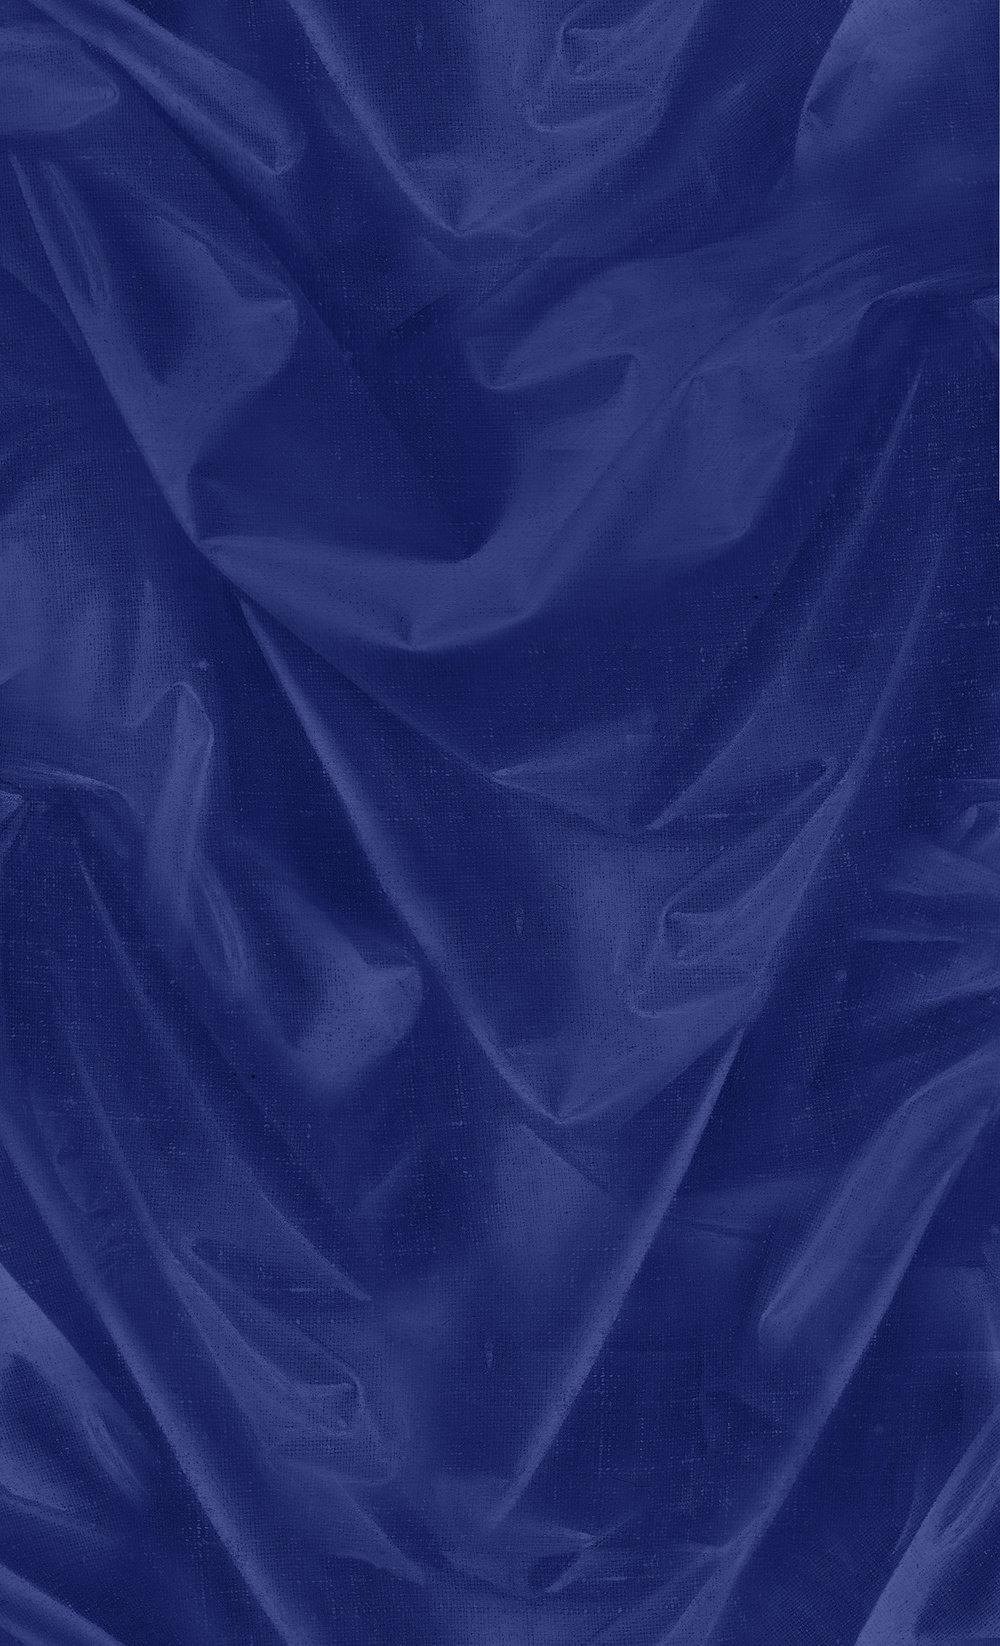 drape print blue file Kopie.jpg